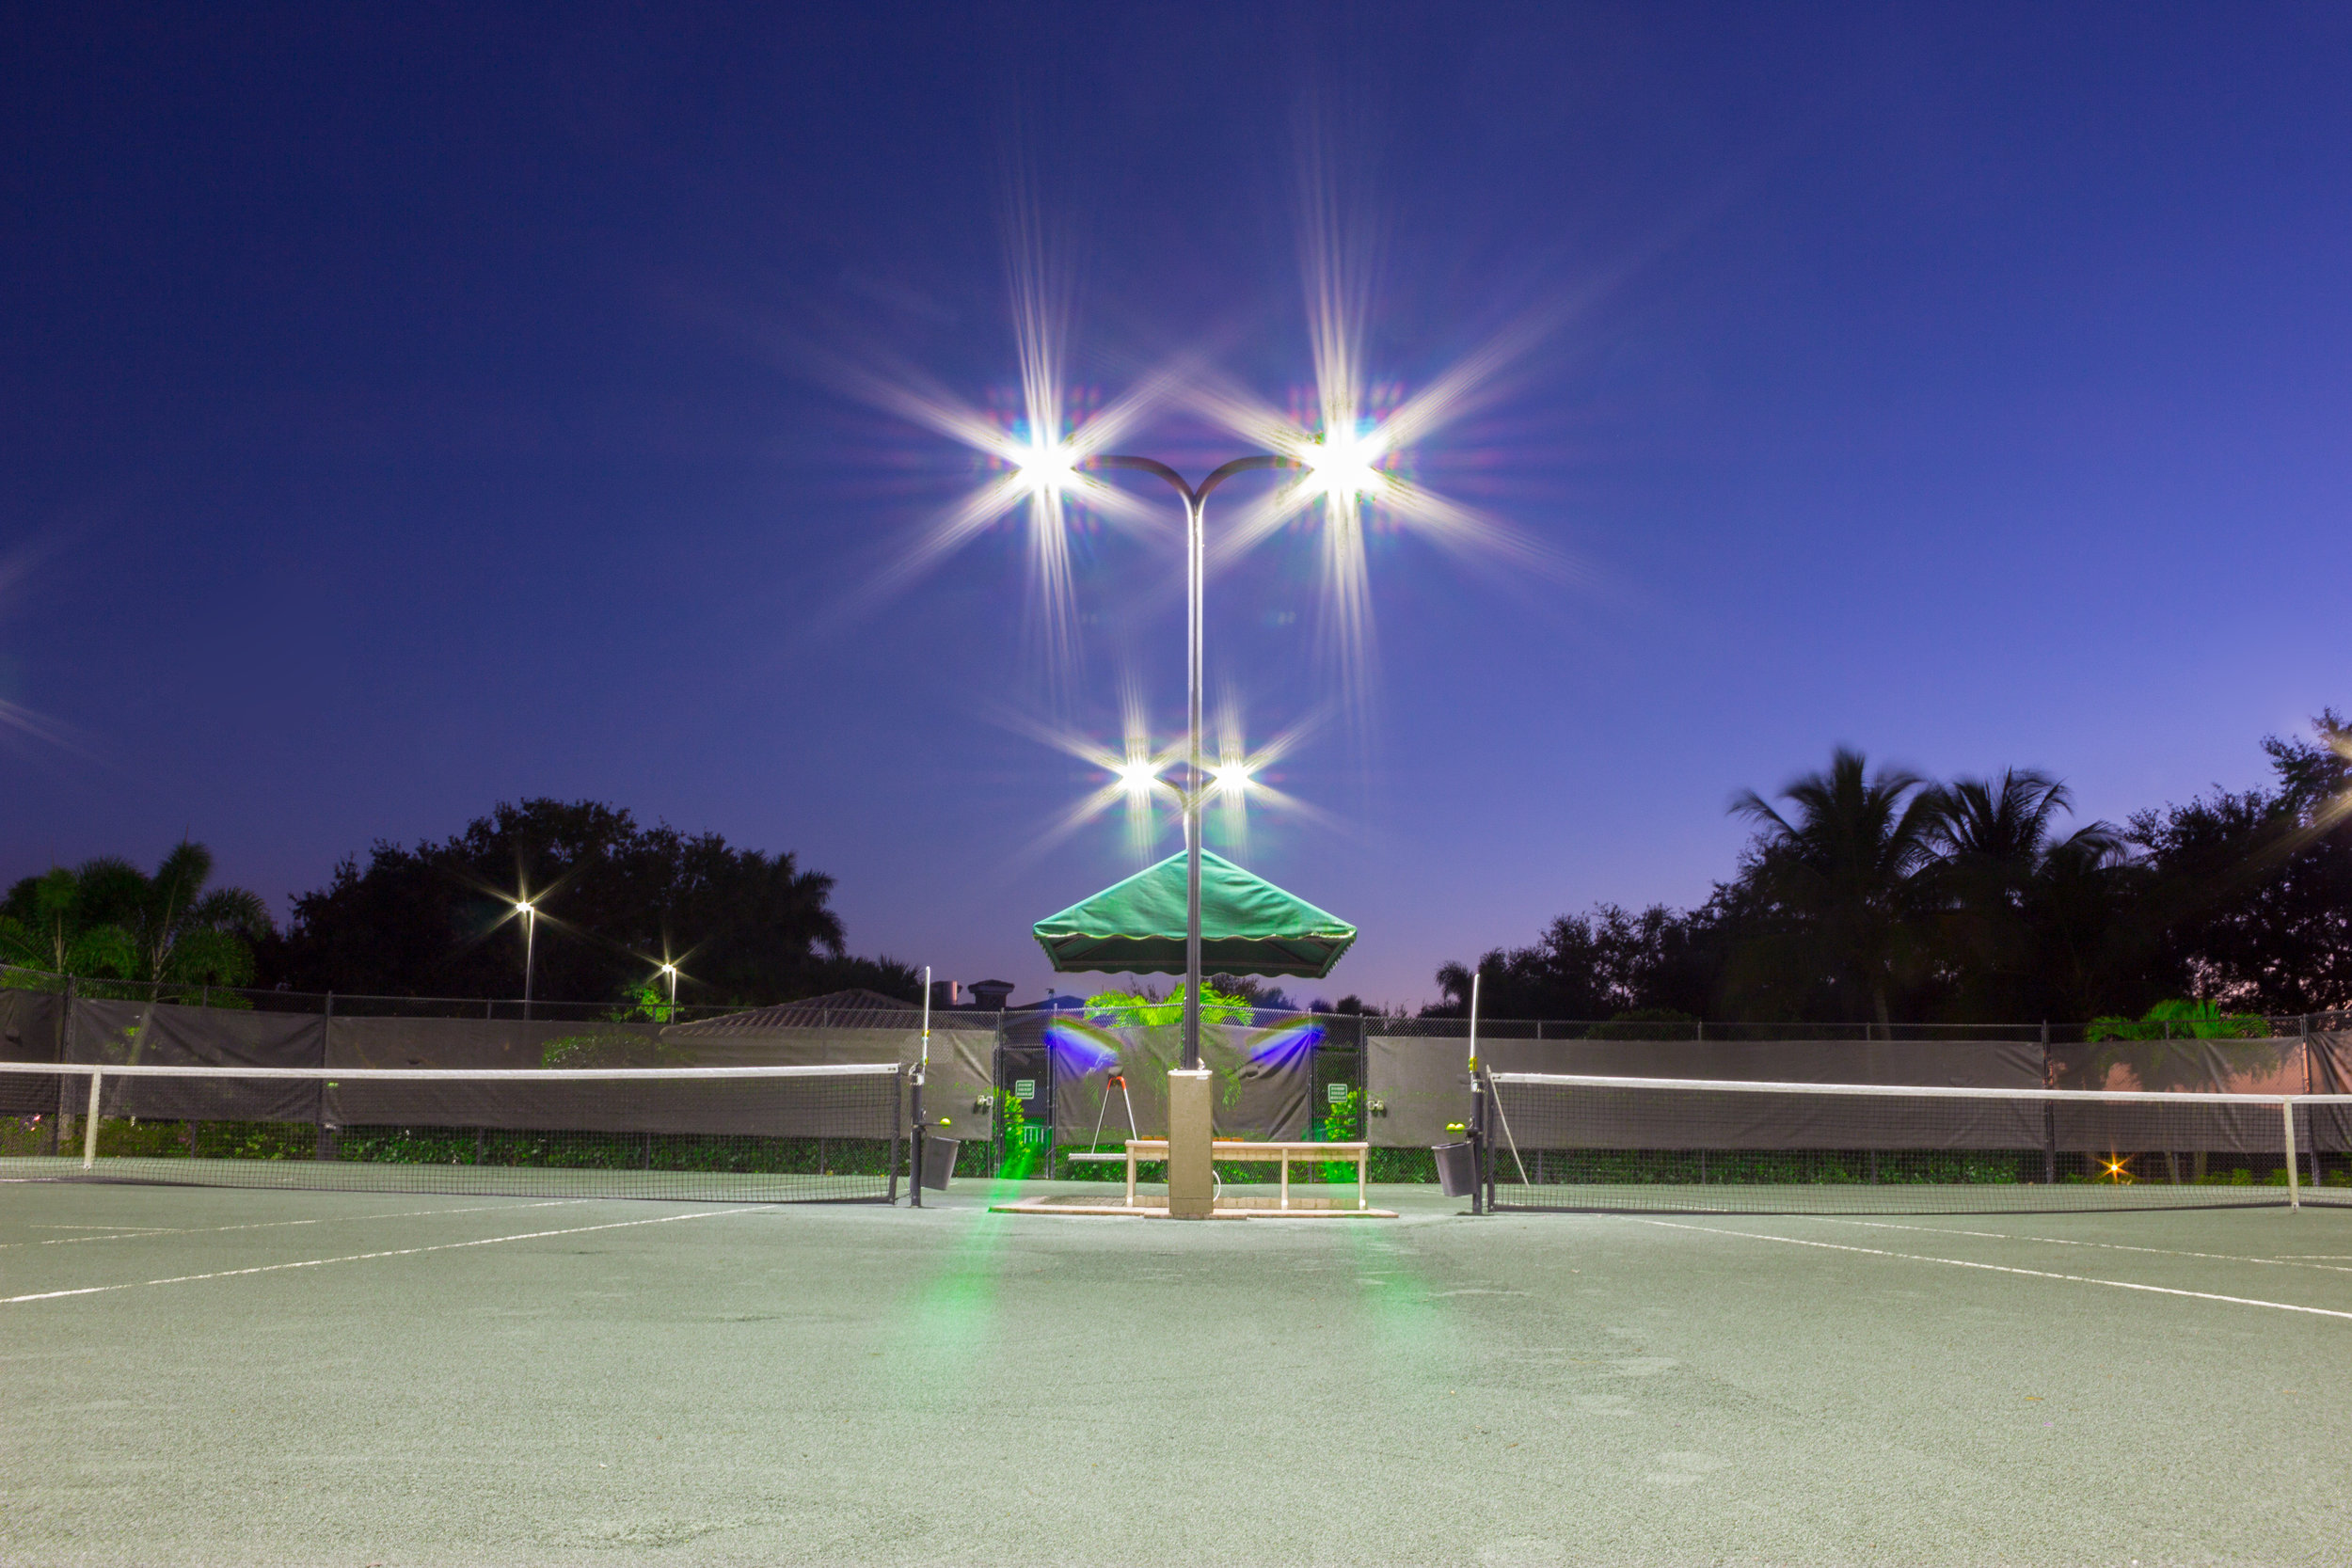 spring-run-golf-club-resort-parking-lot-tennis-court-lighting-2.jpg